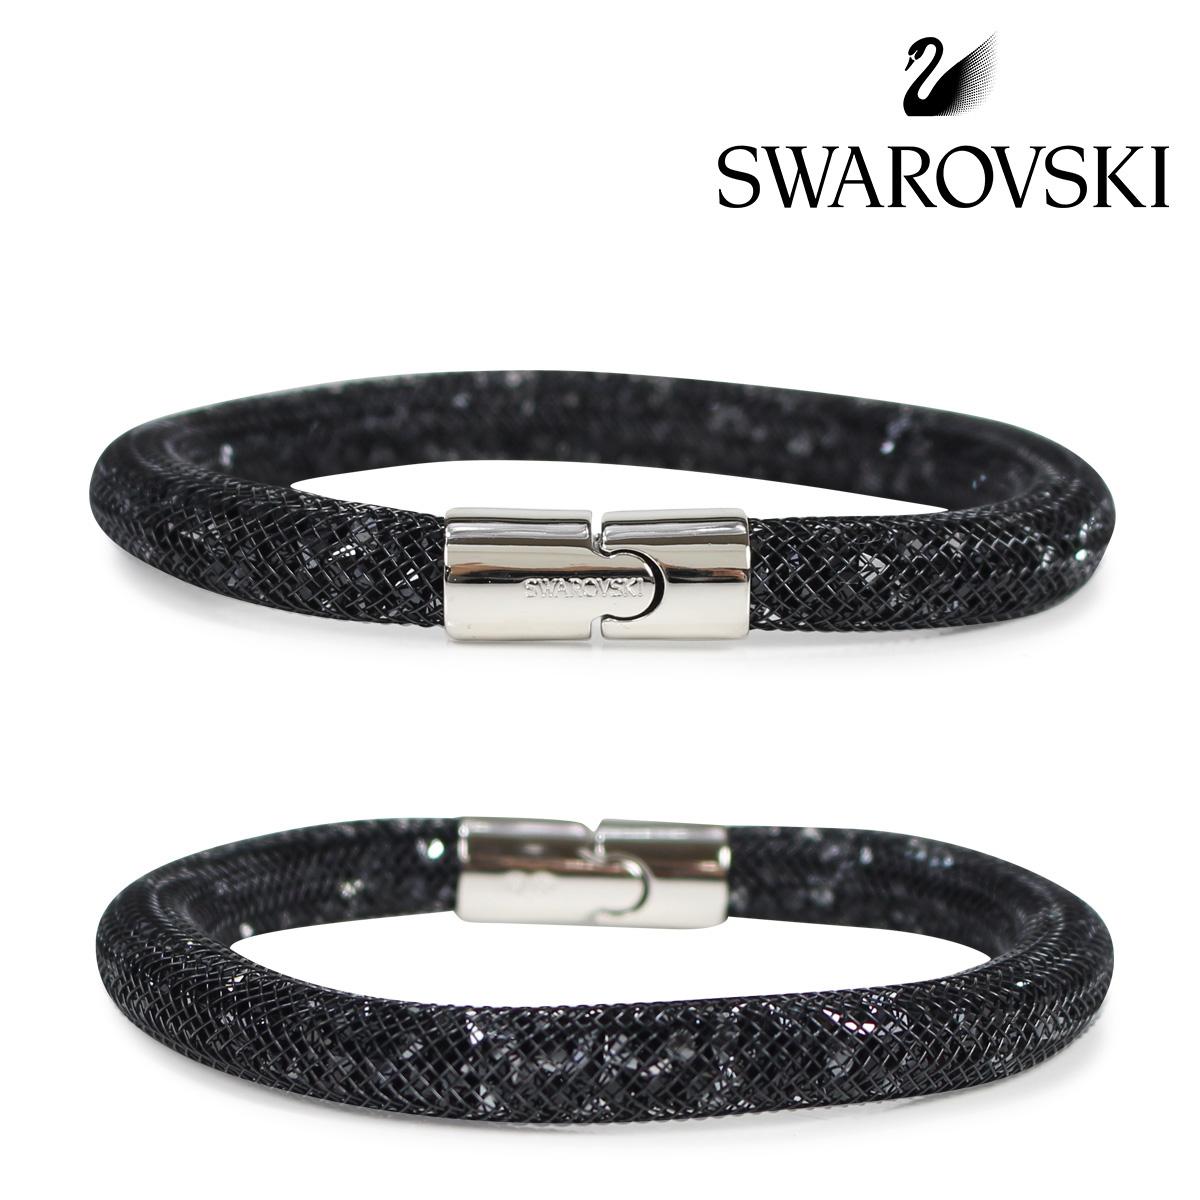 6d5f3b905b2e8 SWAROVSKI STARDUST Swarovski bracelet Lady's black 5102552 S [3/19 Shinnyu  load]